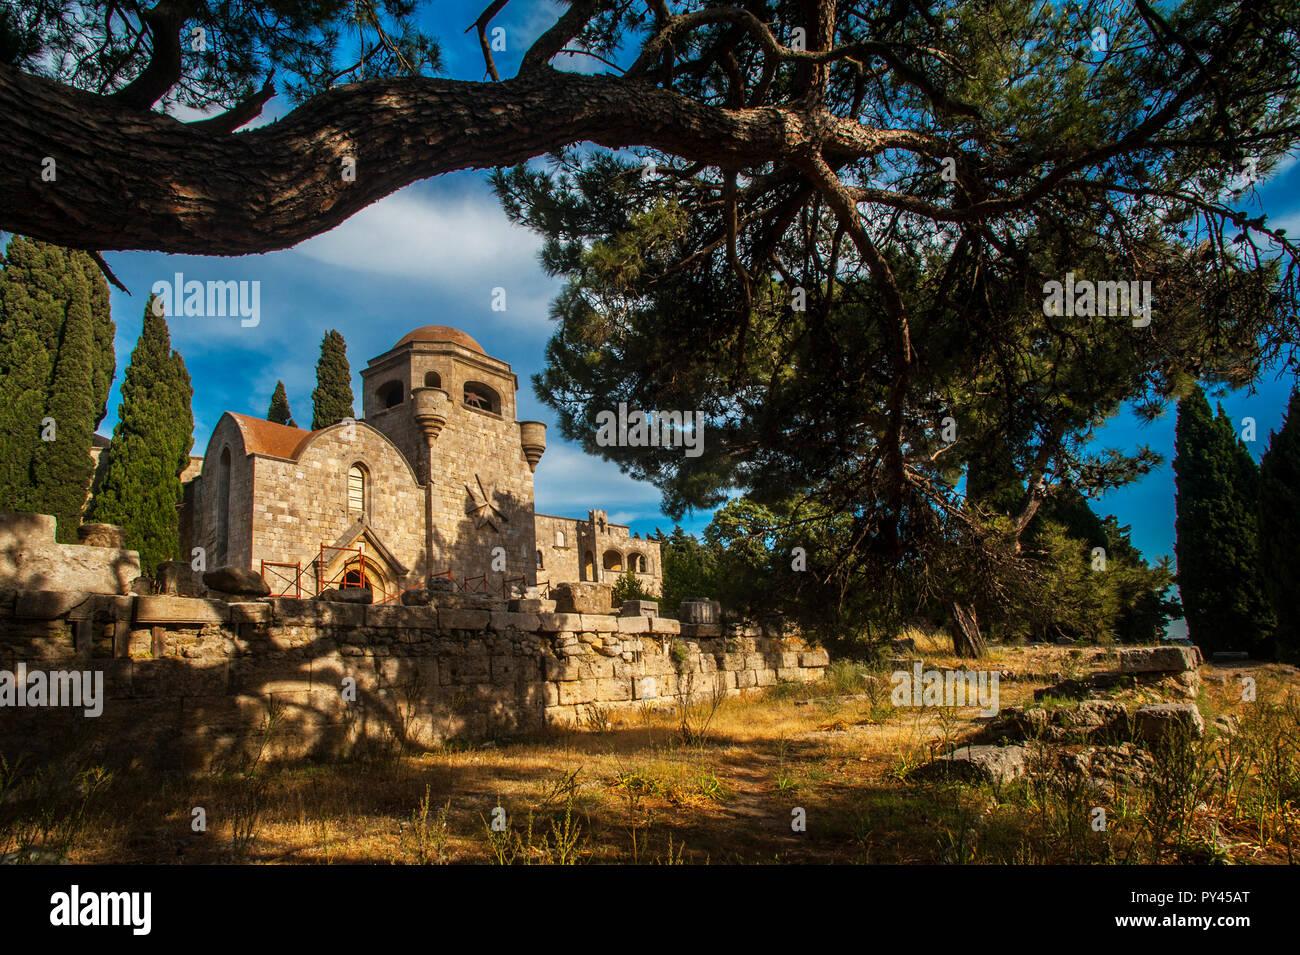 europe, greece, dodecanese, rhodes, filerimos - Stock Image